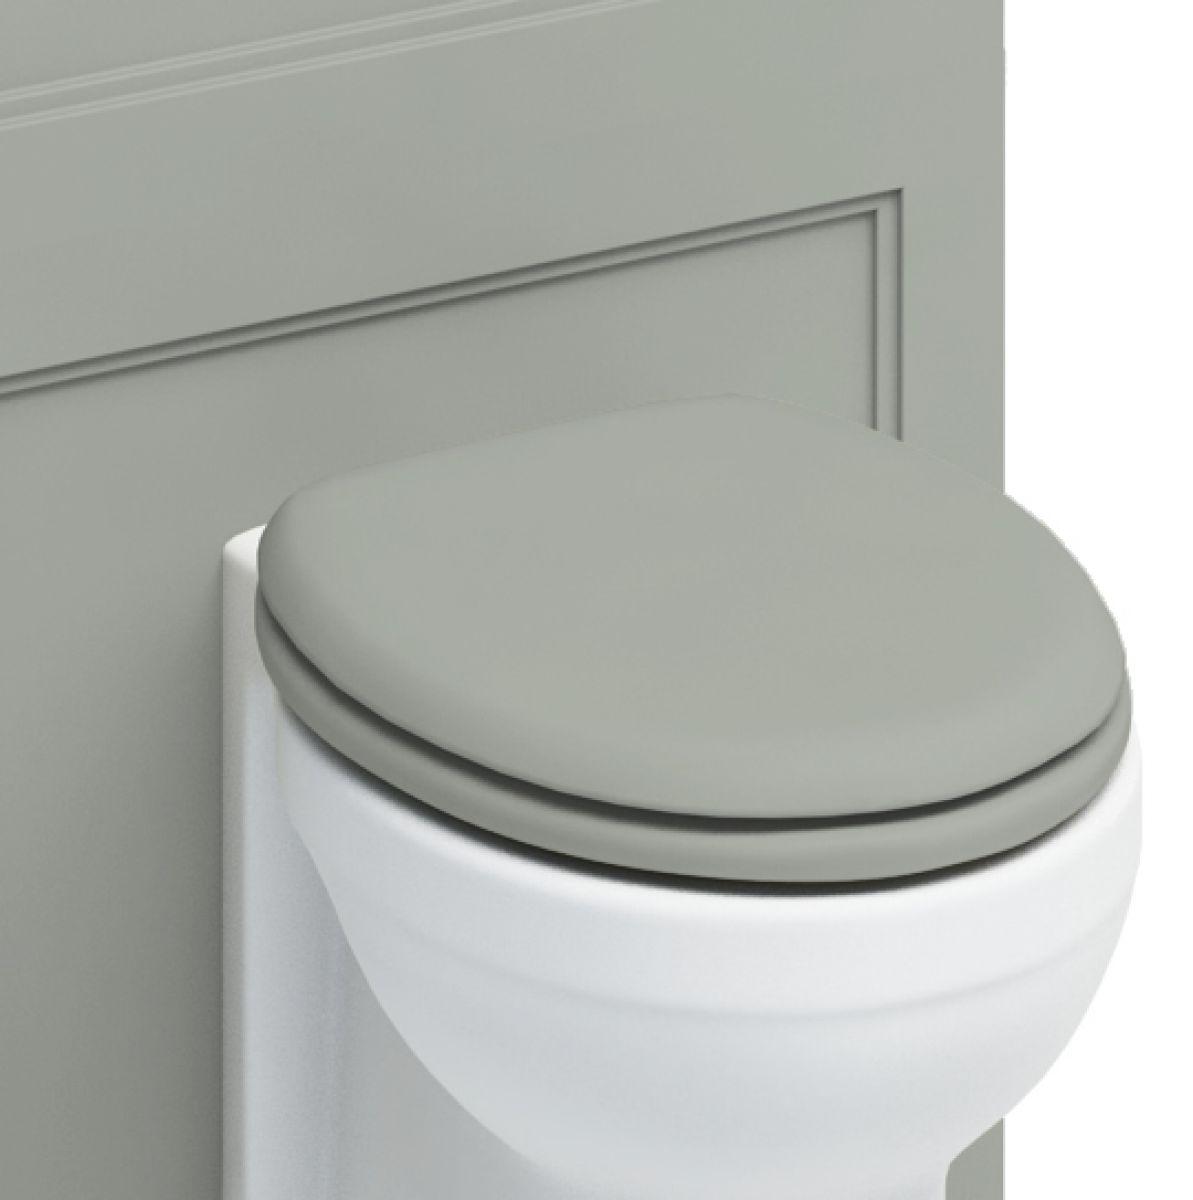 burlington painted soft close toilet seat uk bathrooms. Black Bedroom Furniture Sets. Home Design Ideas